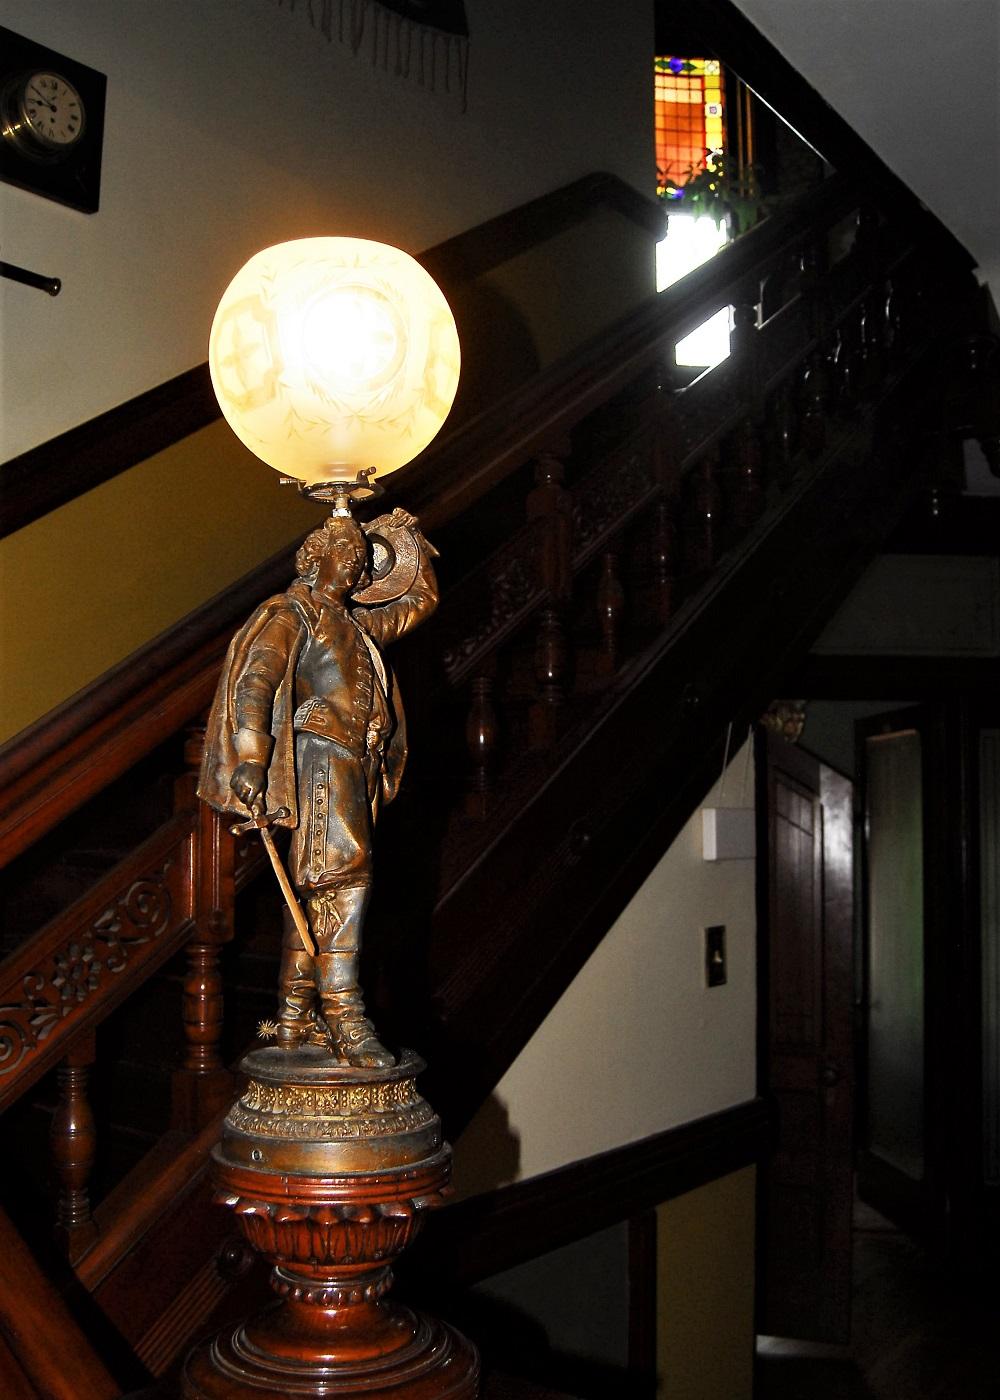 Lighted Newel Post Statue